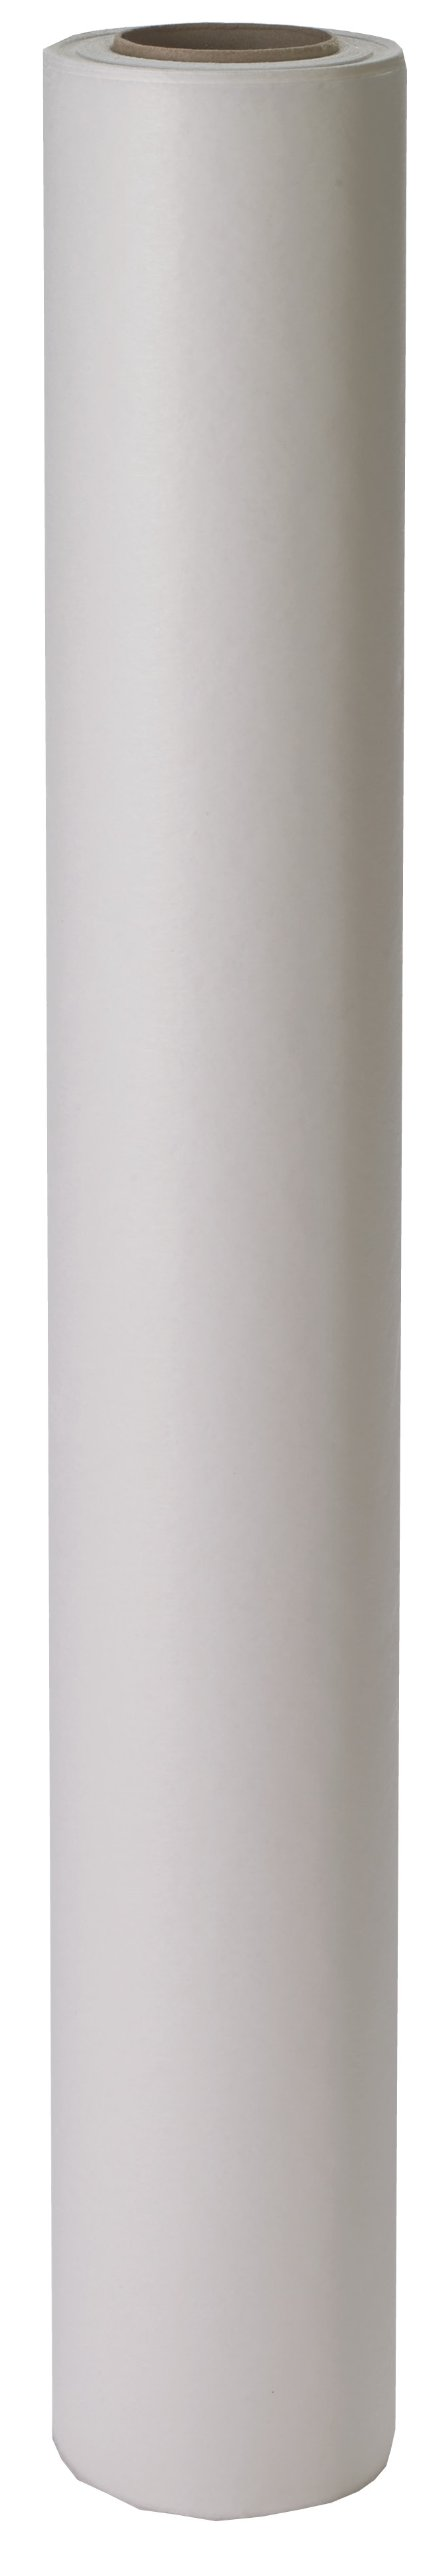 Bilt-Rite Mastex Health Smooth Table Paper, White, 21 Inch